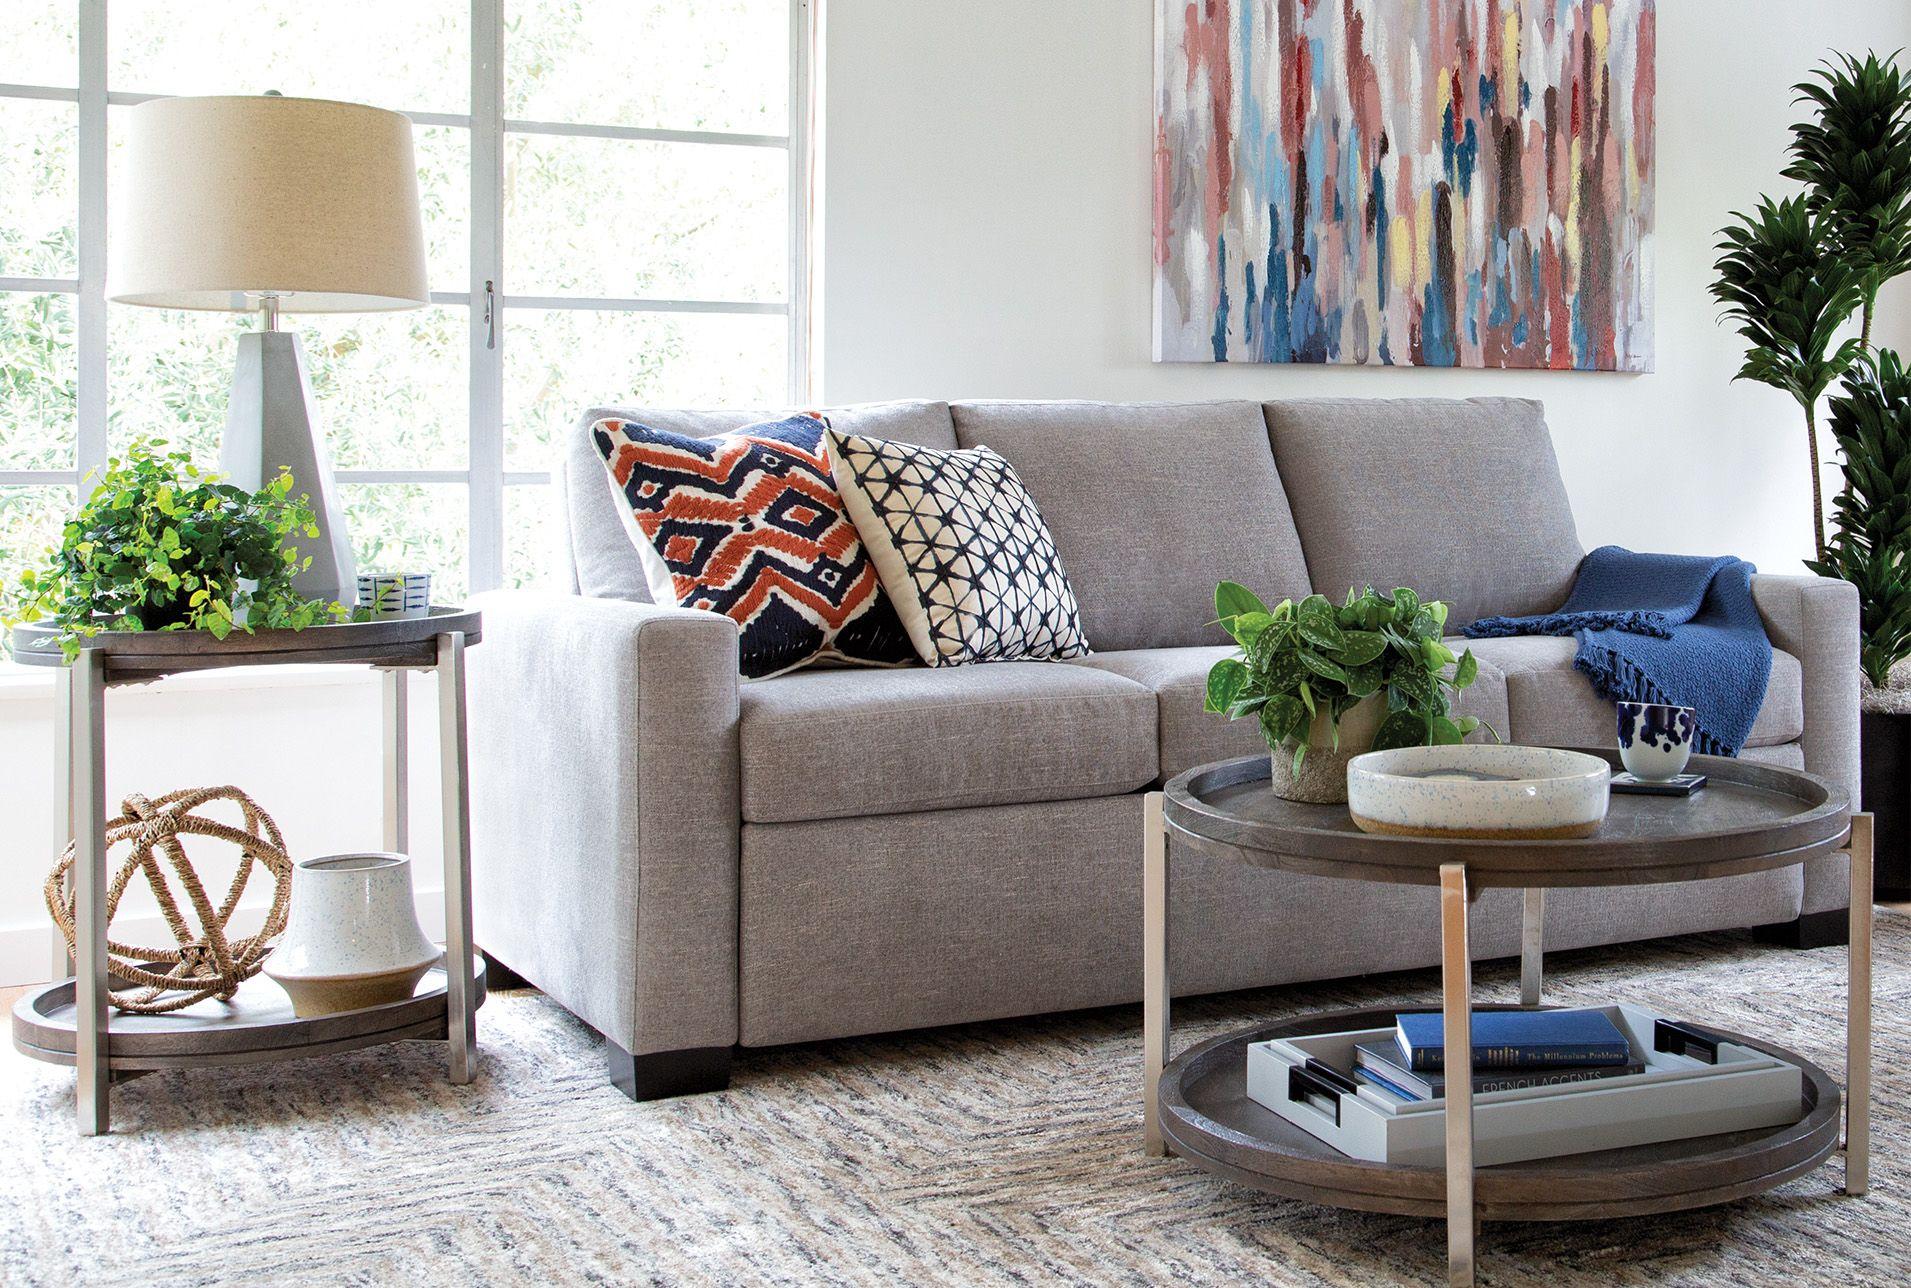 Fantastic Mackenzie Silverpine Queen Plus Sofa Sleeper Products In Dailytribune Chair Design For Home Dailytribuneorg